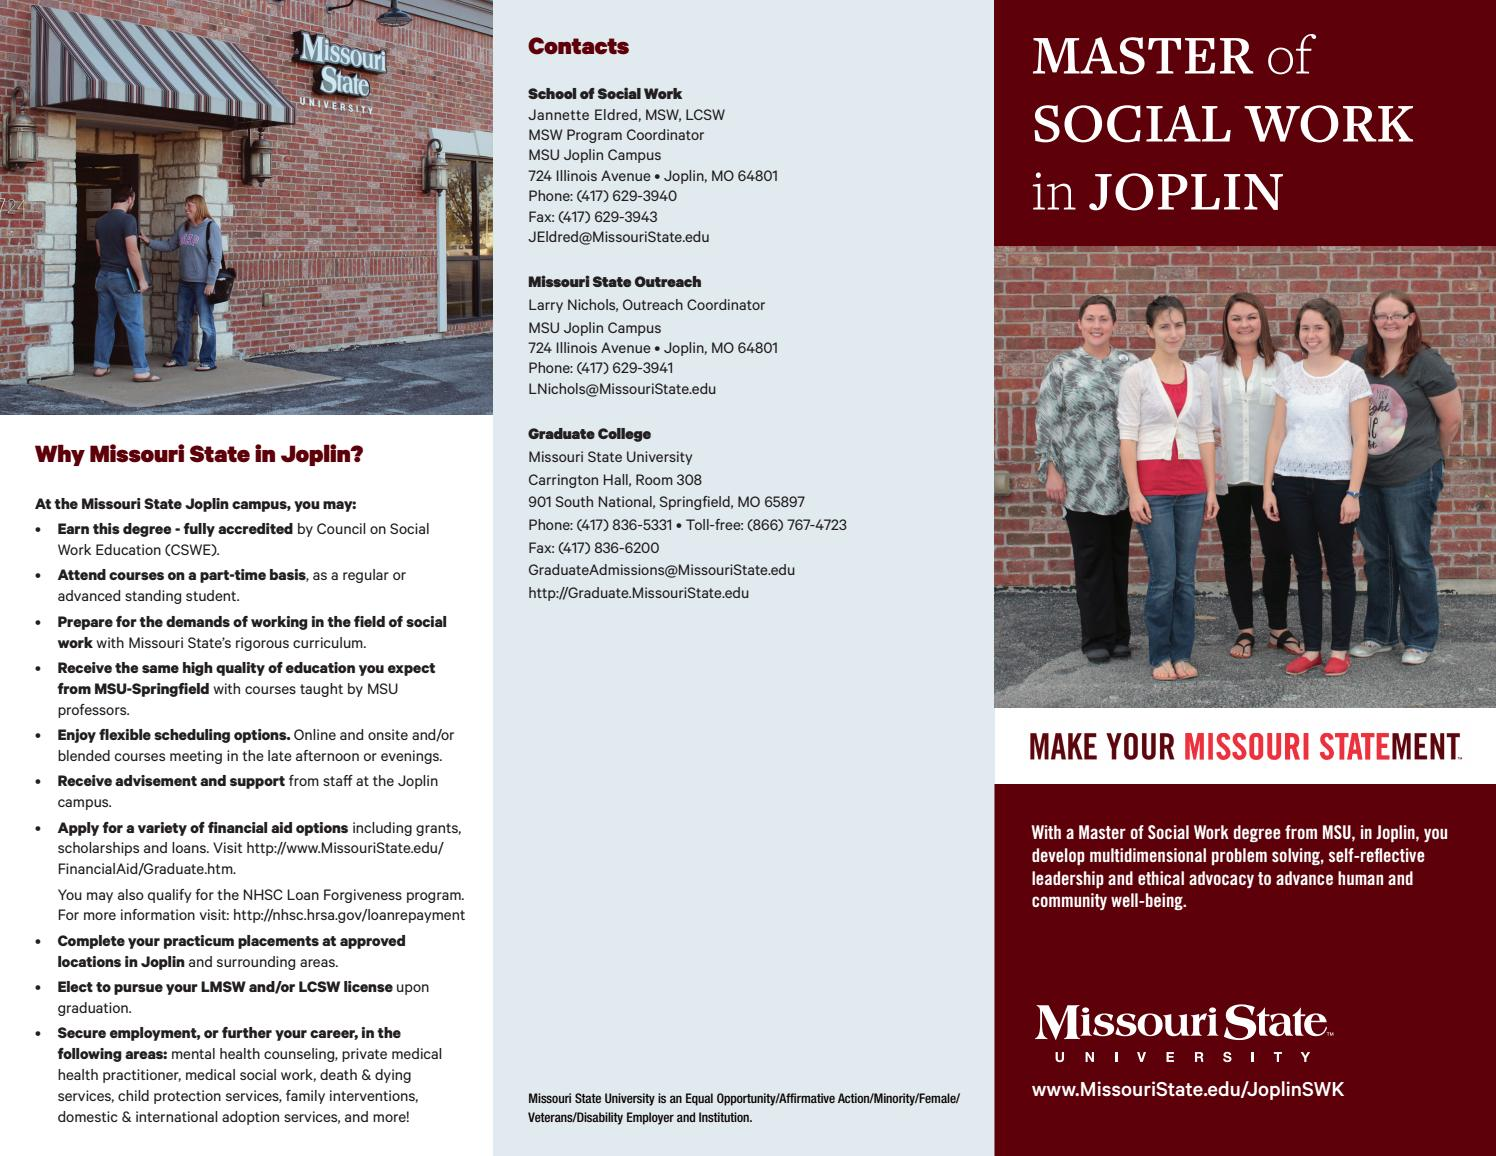 Master Of Social Work In Joplin By Missouri State